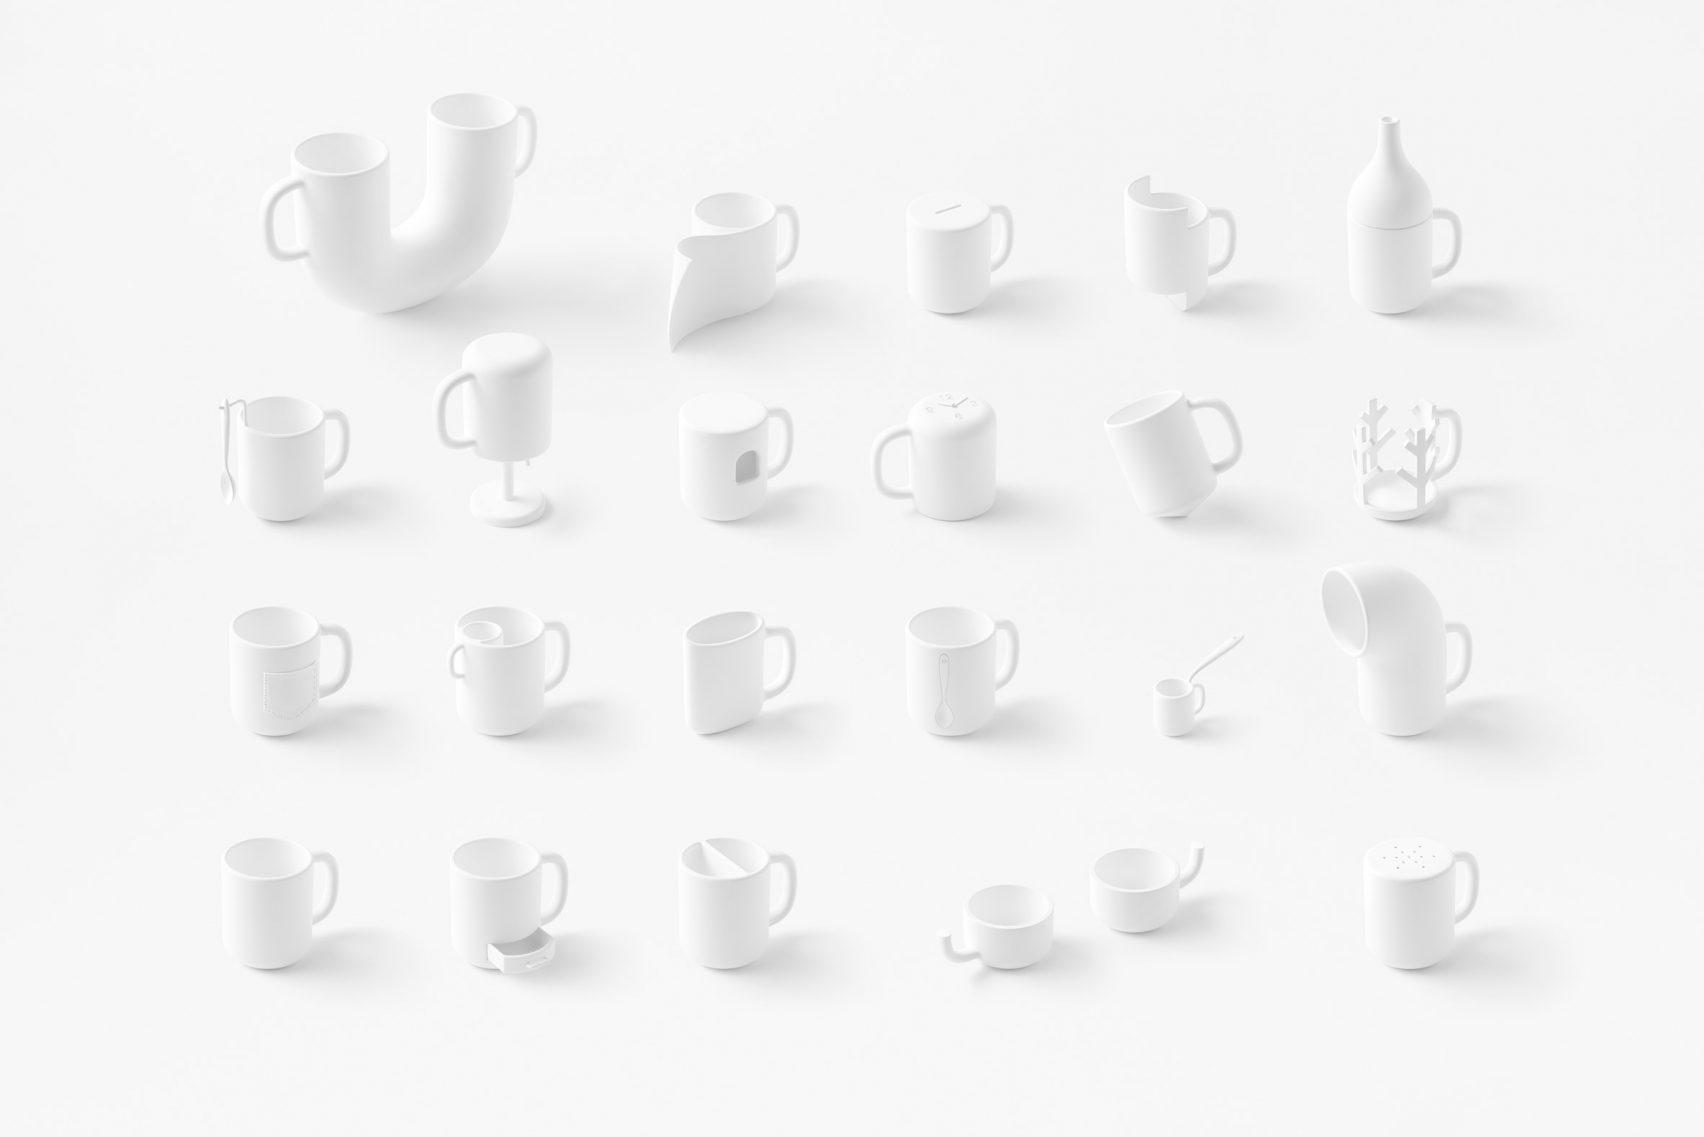 nendo-not-just-a-cup-akihiro-yoshida-4